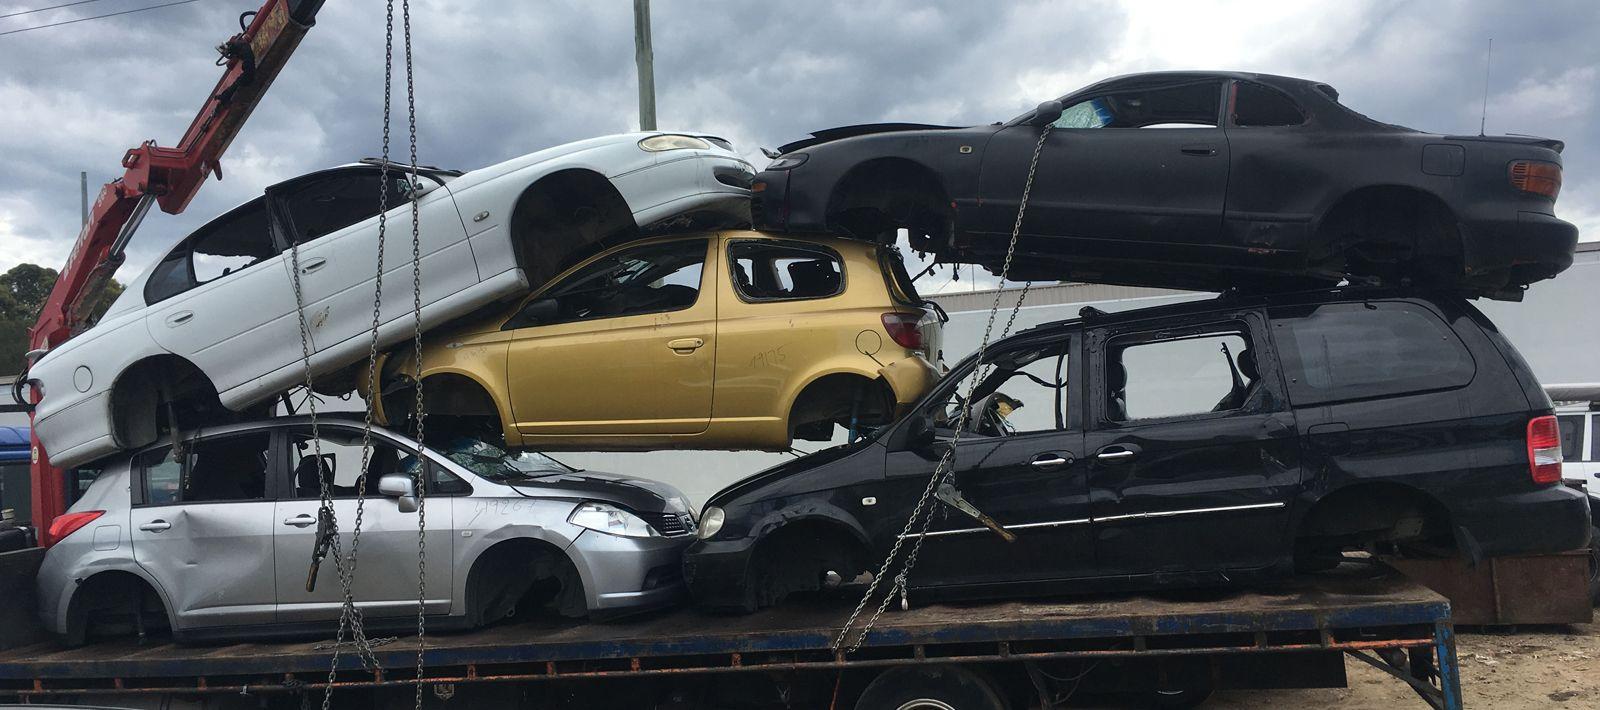 we scrap car is now offering a reliable Scrap Car service